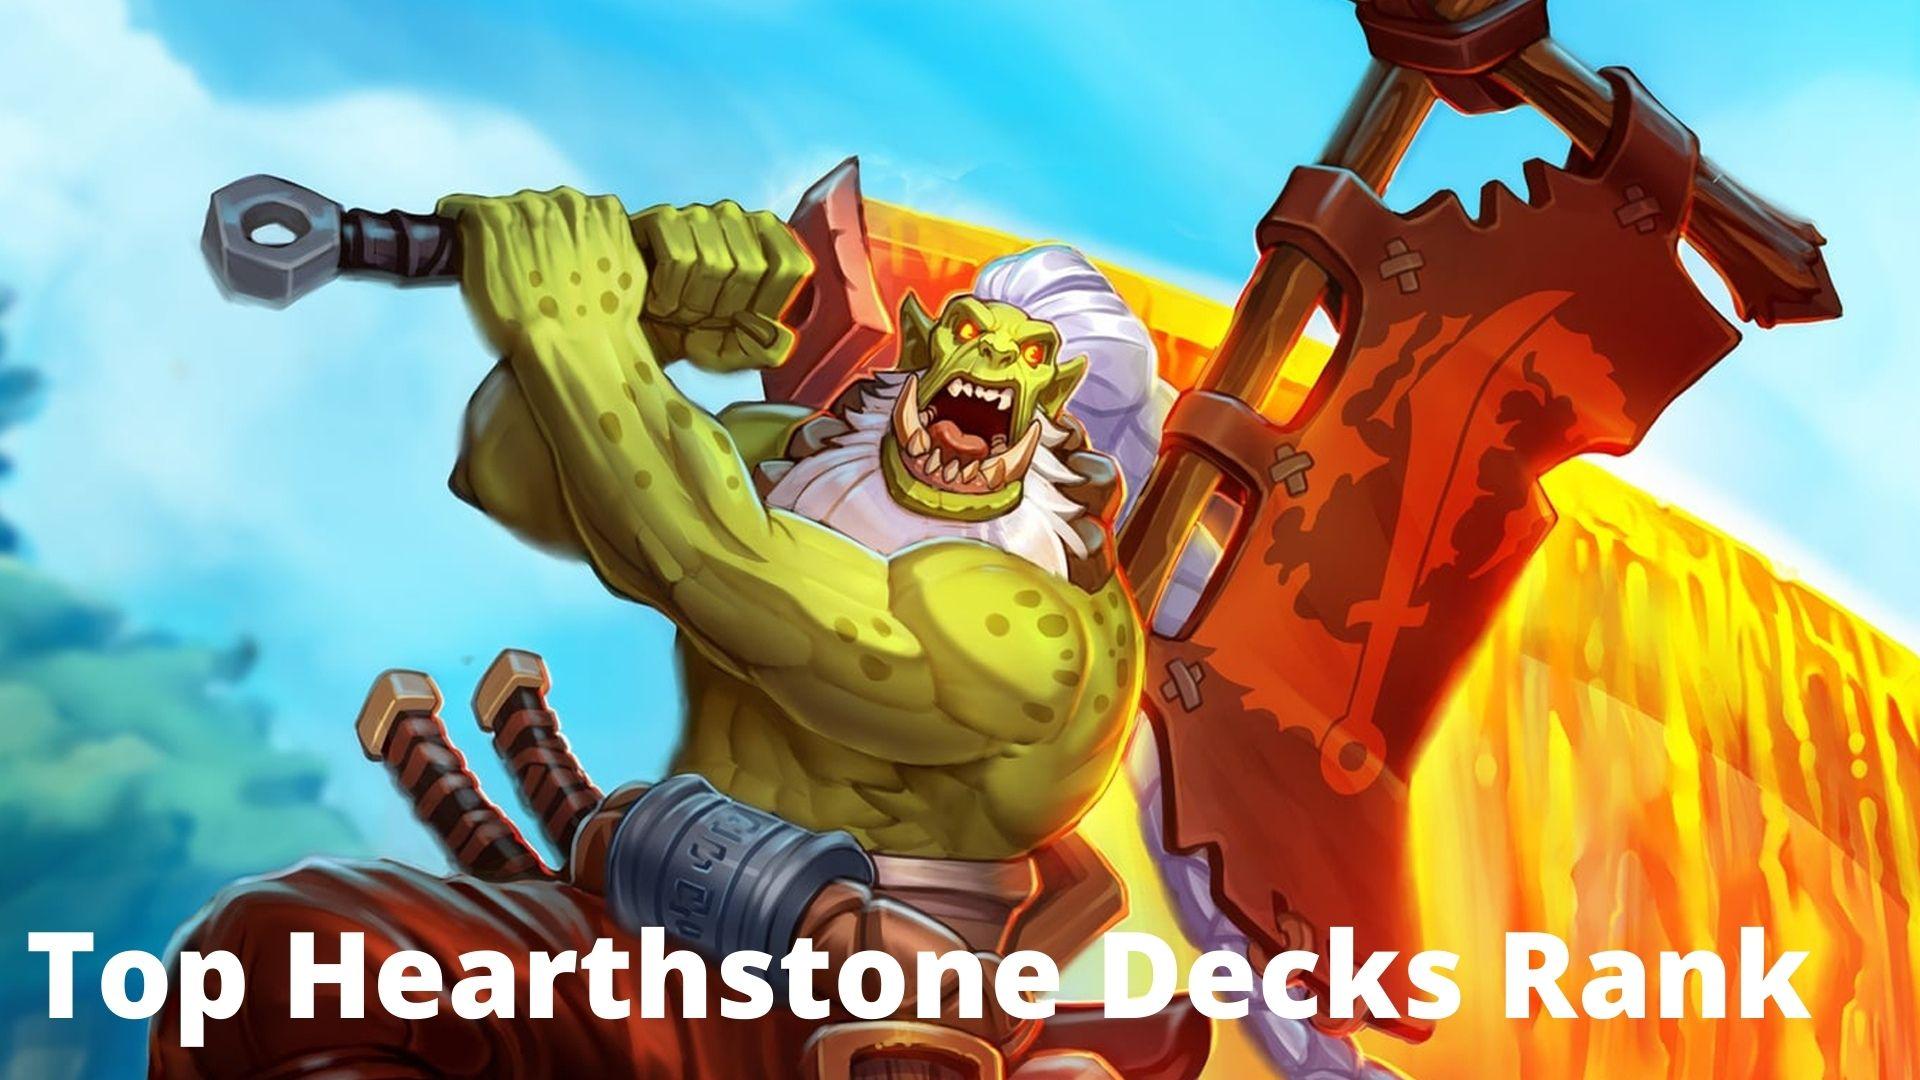 Top Hearthstone Decks Rank